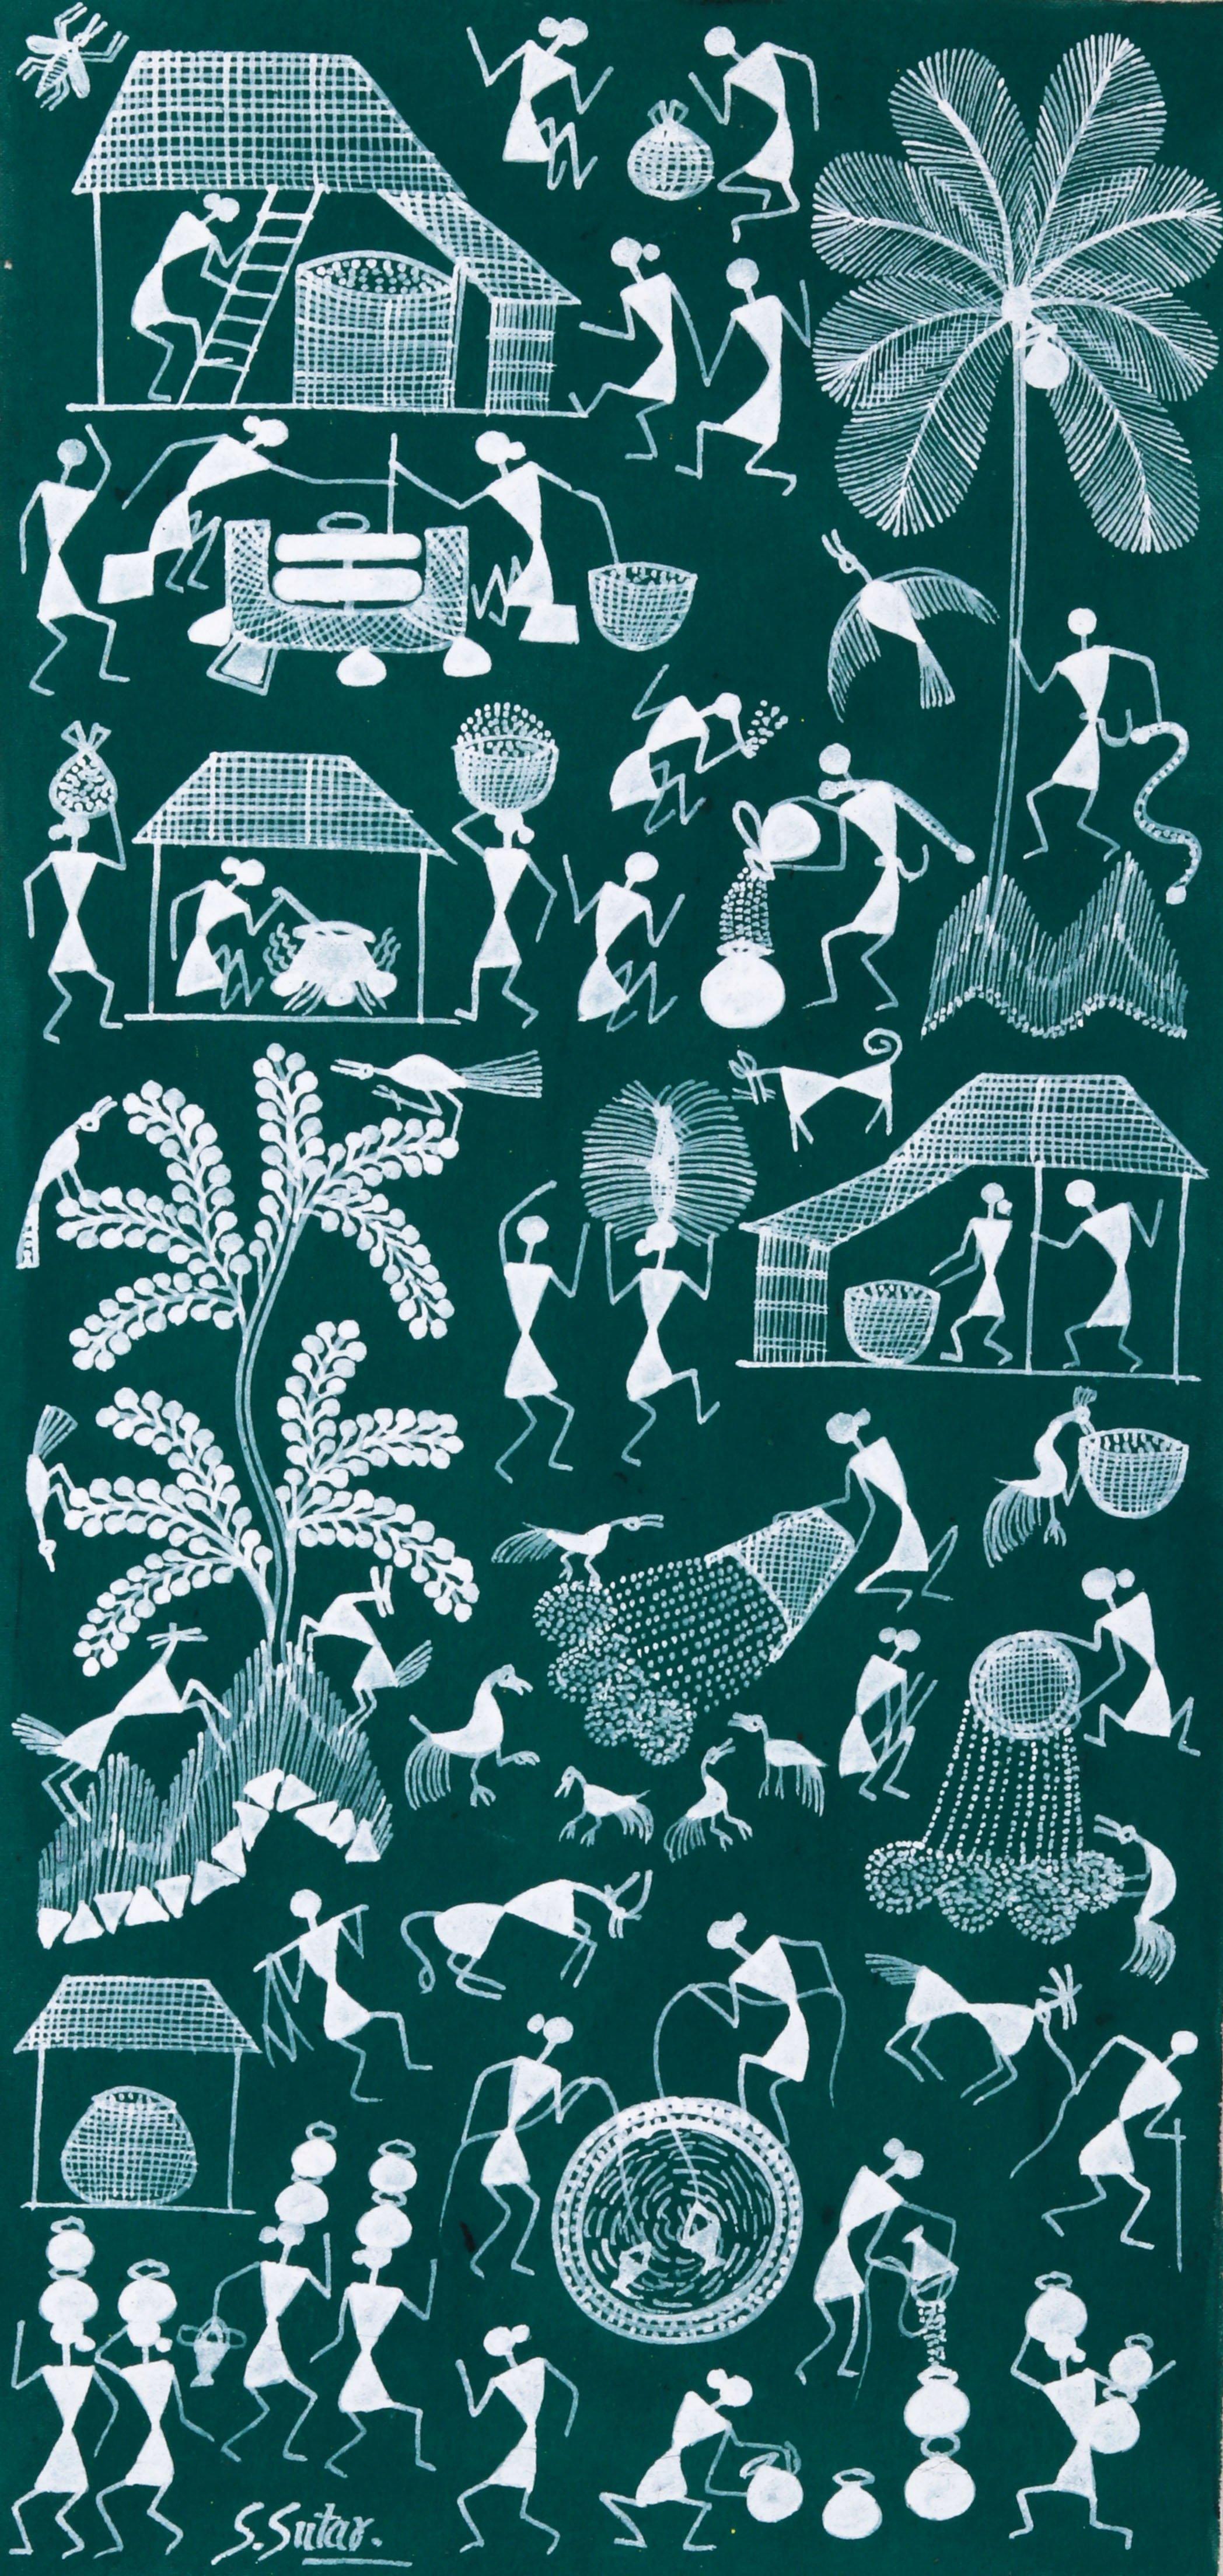 Paintings > Folk Art > Warli > Scenes of Human Life in Village